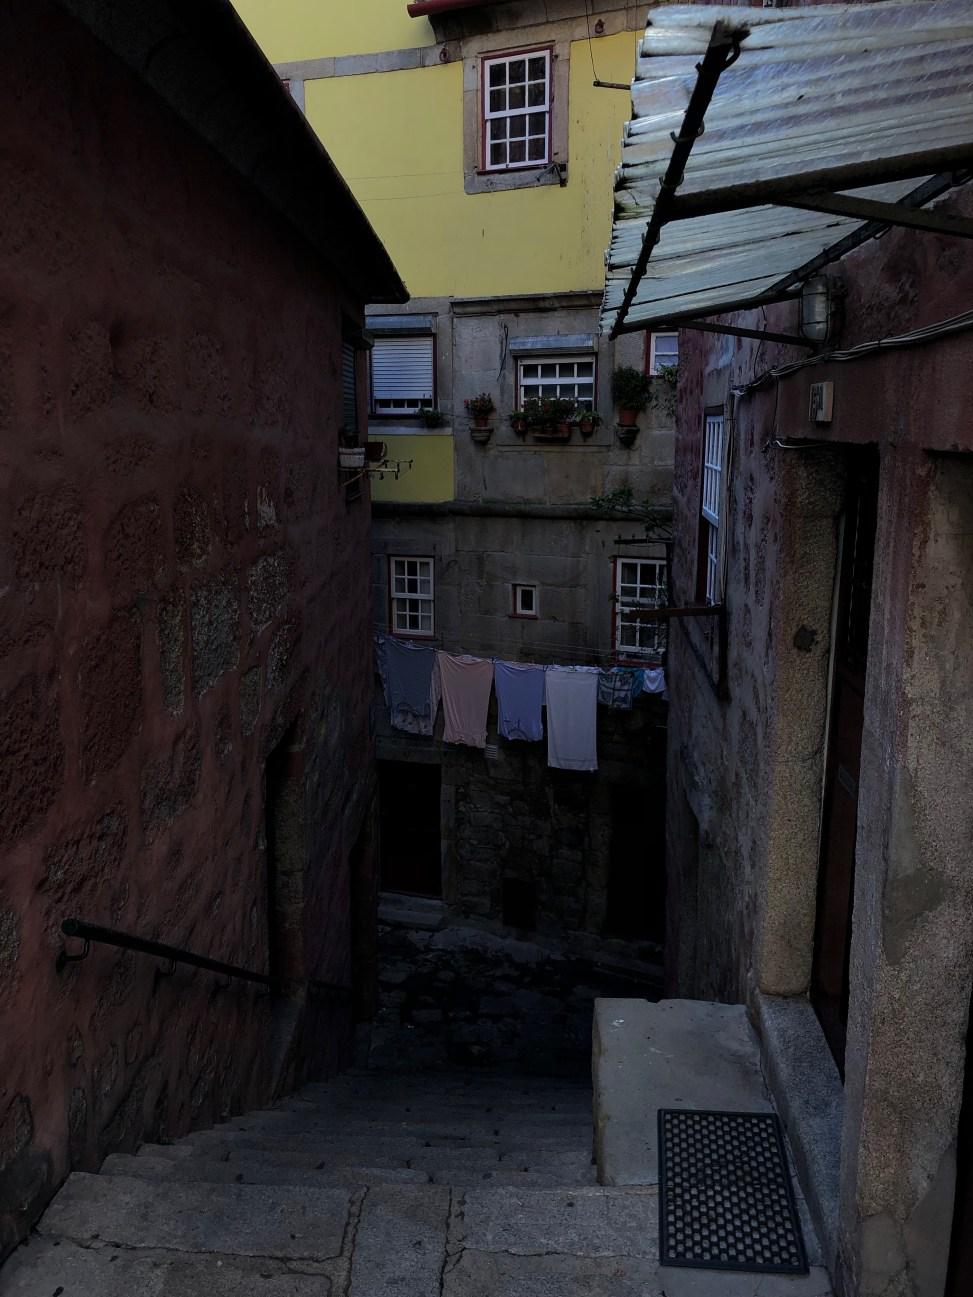 Streets of Porto, Portugal